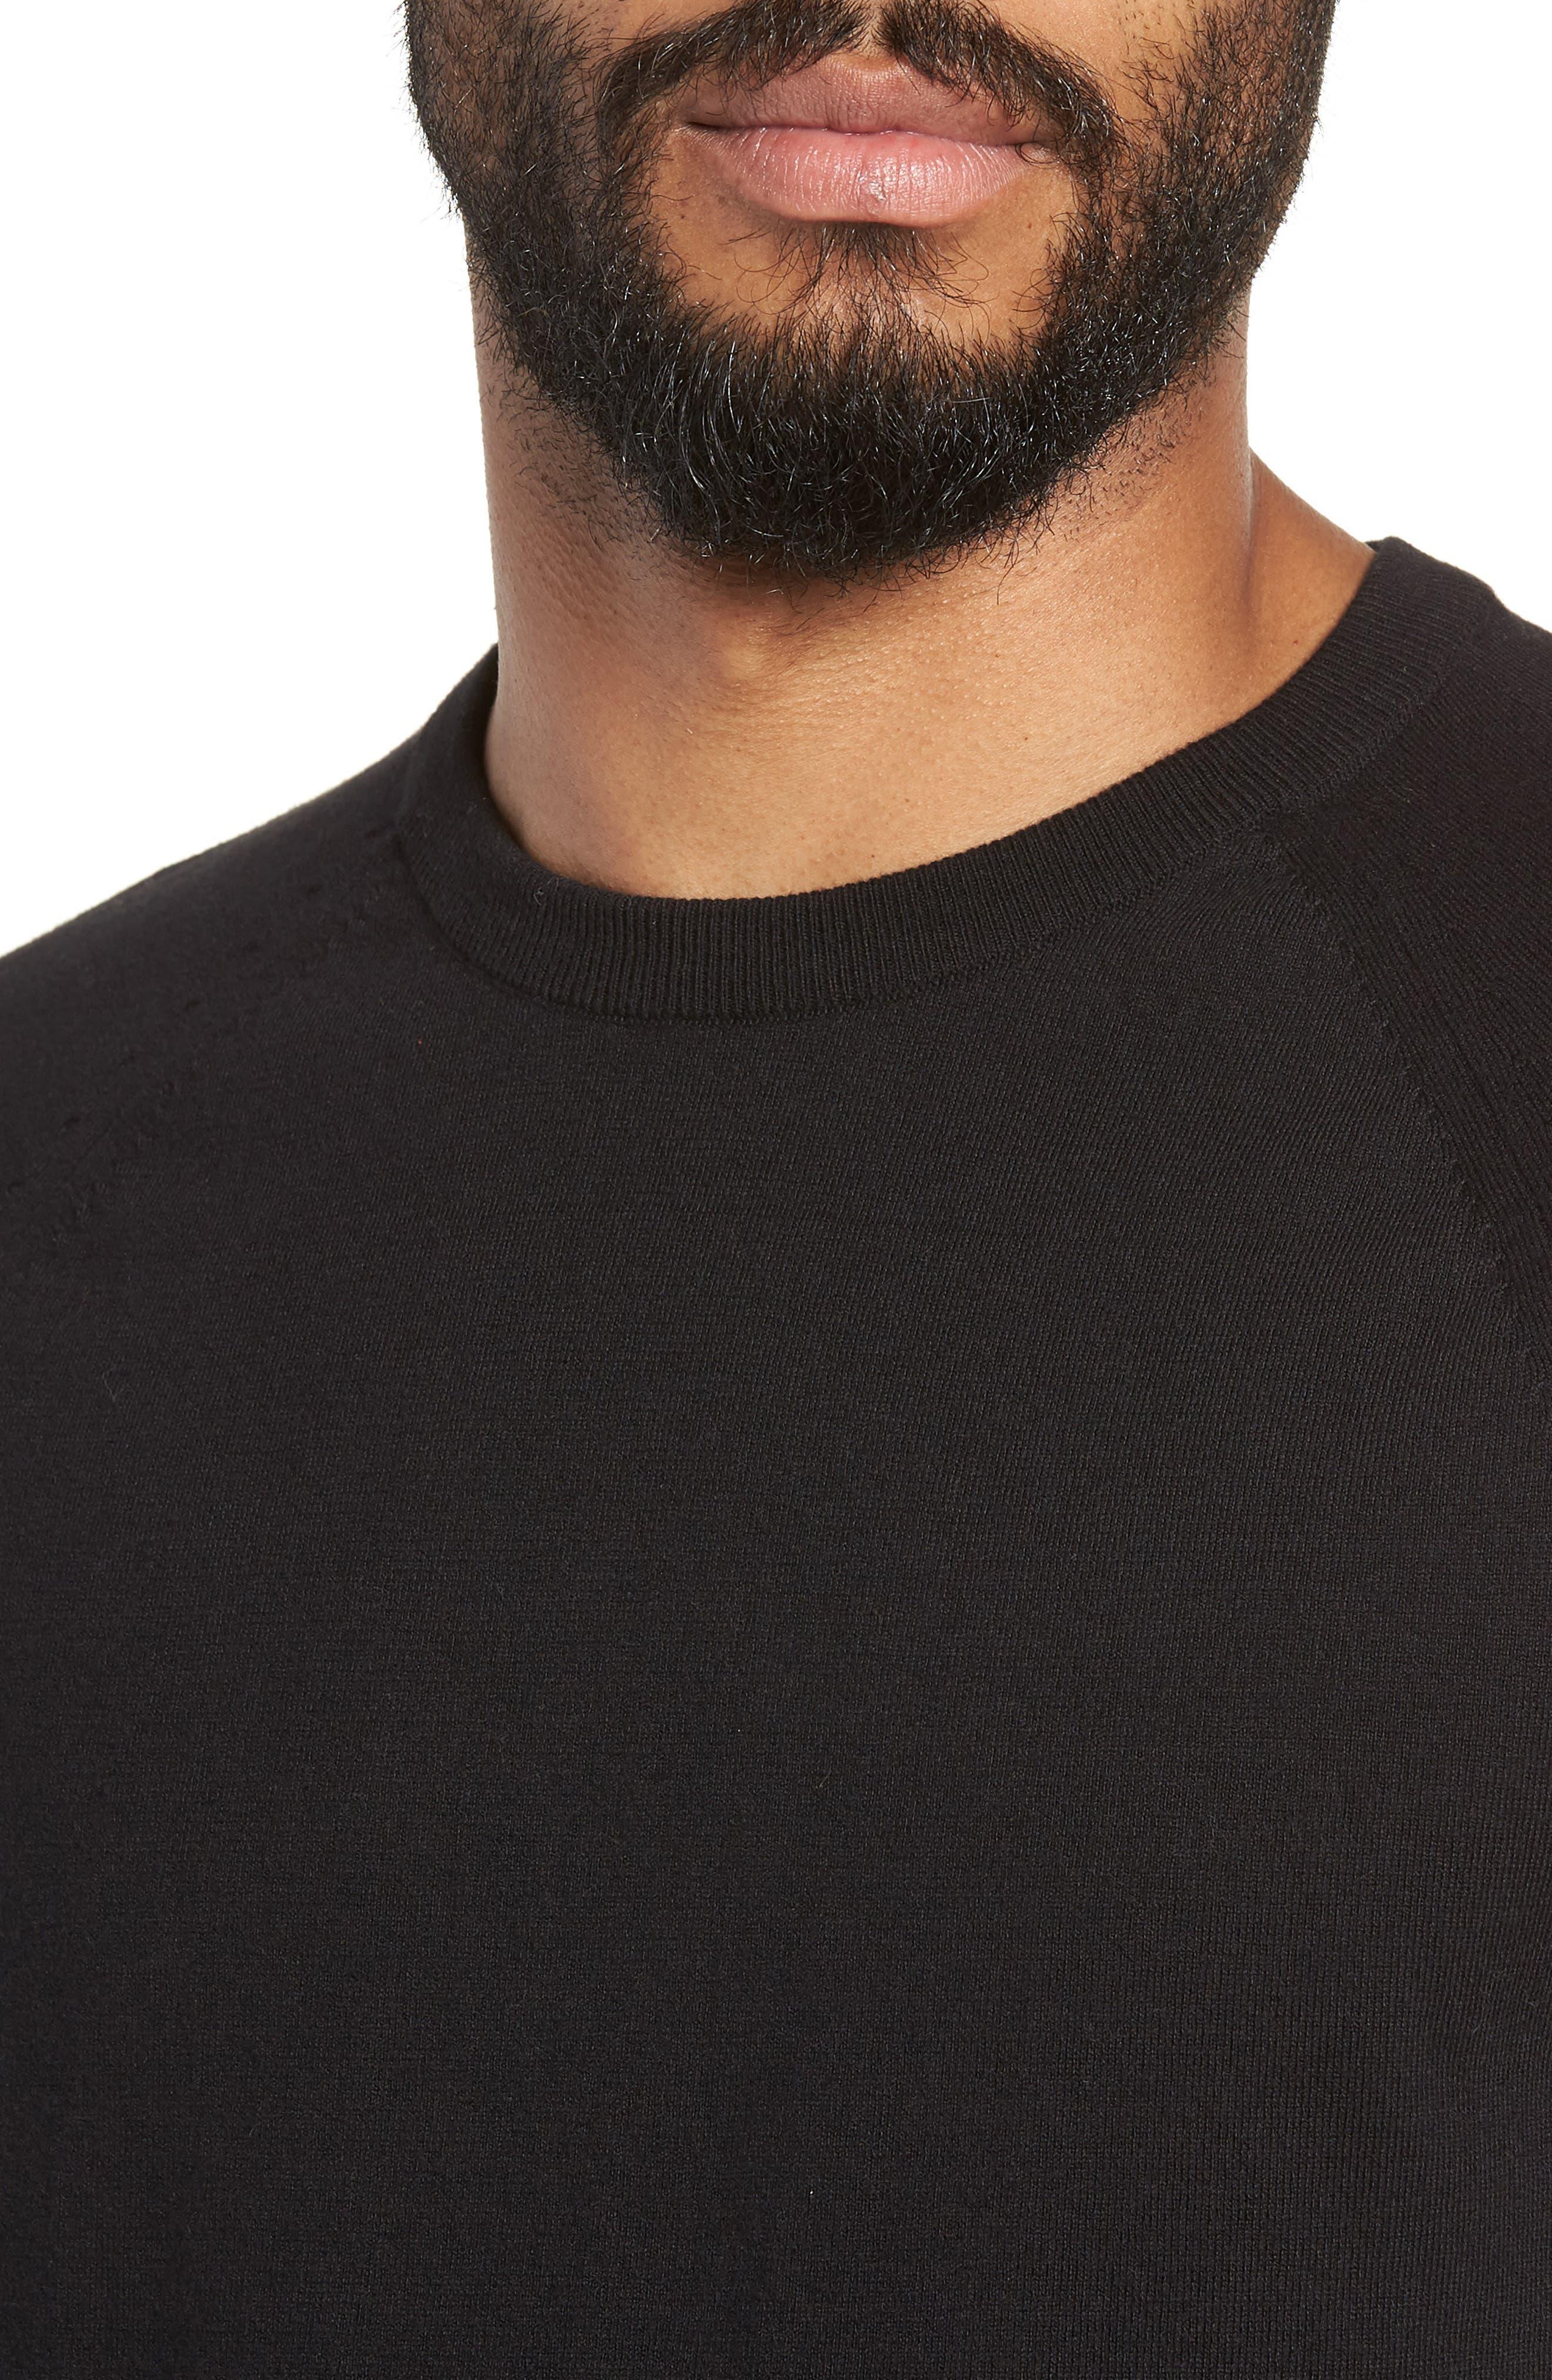 Regular Fit Stretch Cotton Crewneck Sweater,                             Alternate thumbnail 4, color,                             BLACK